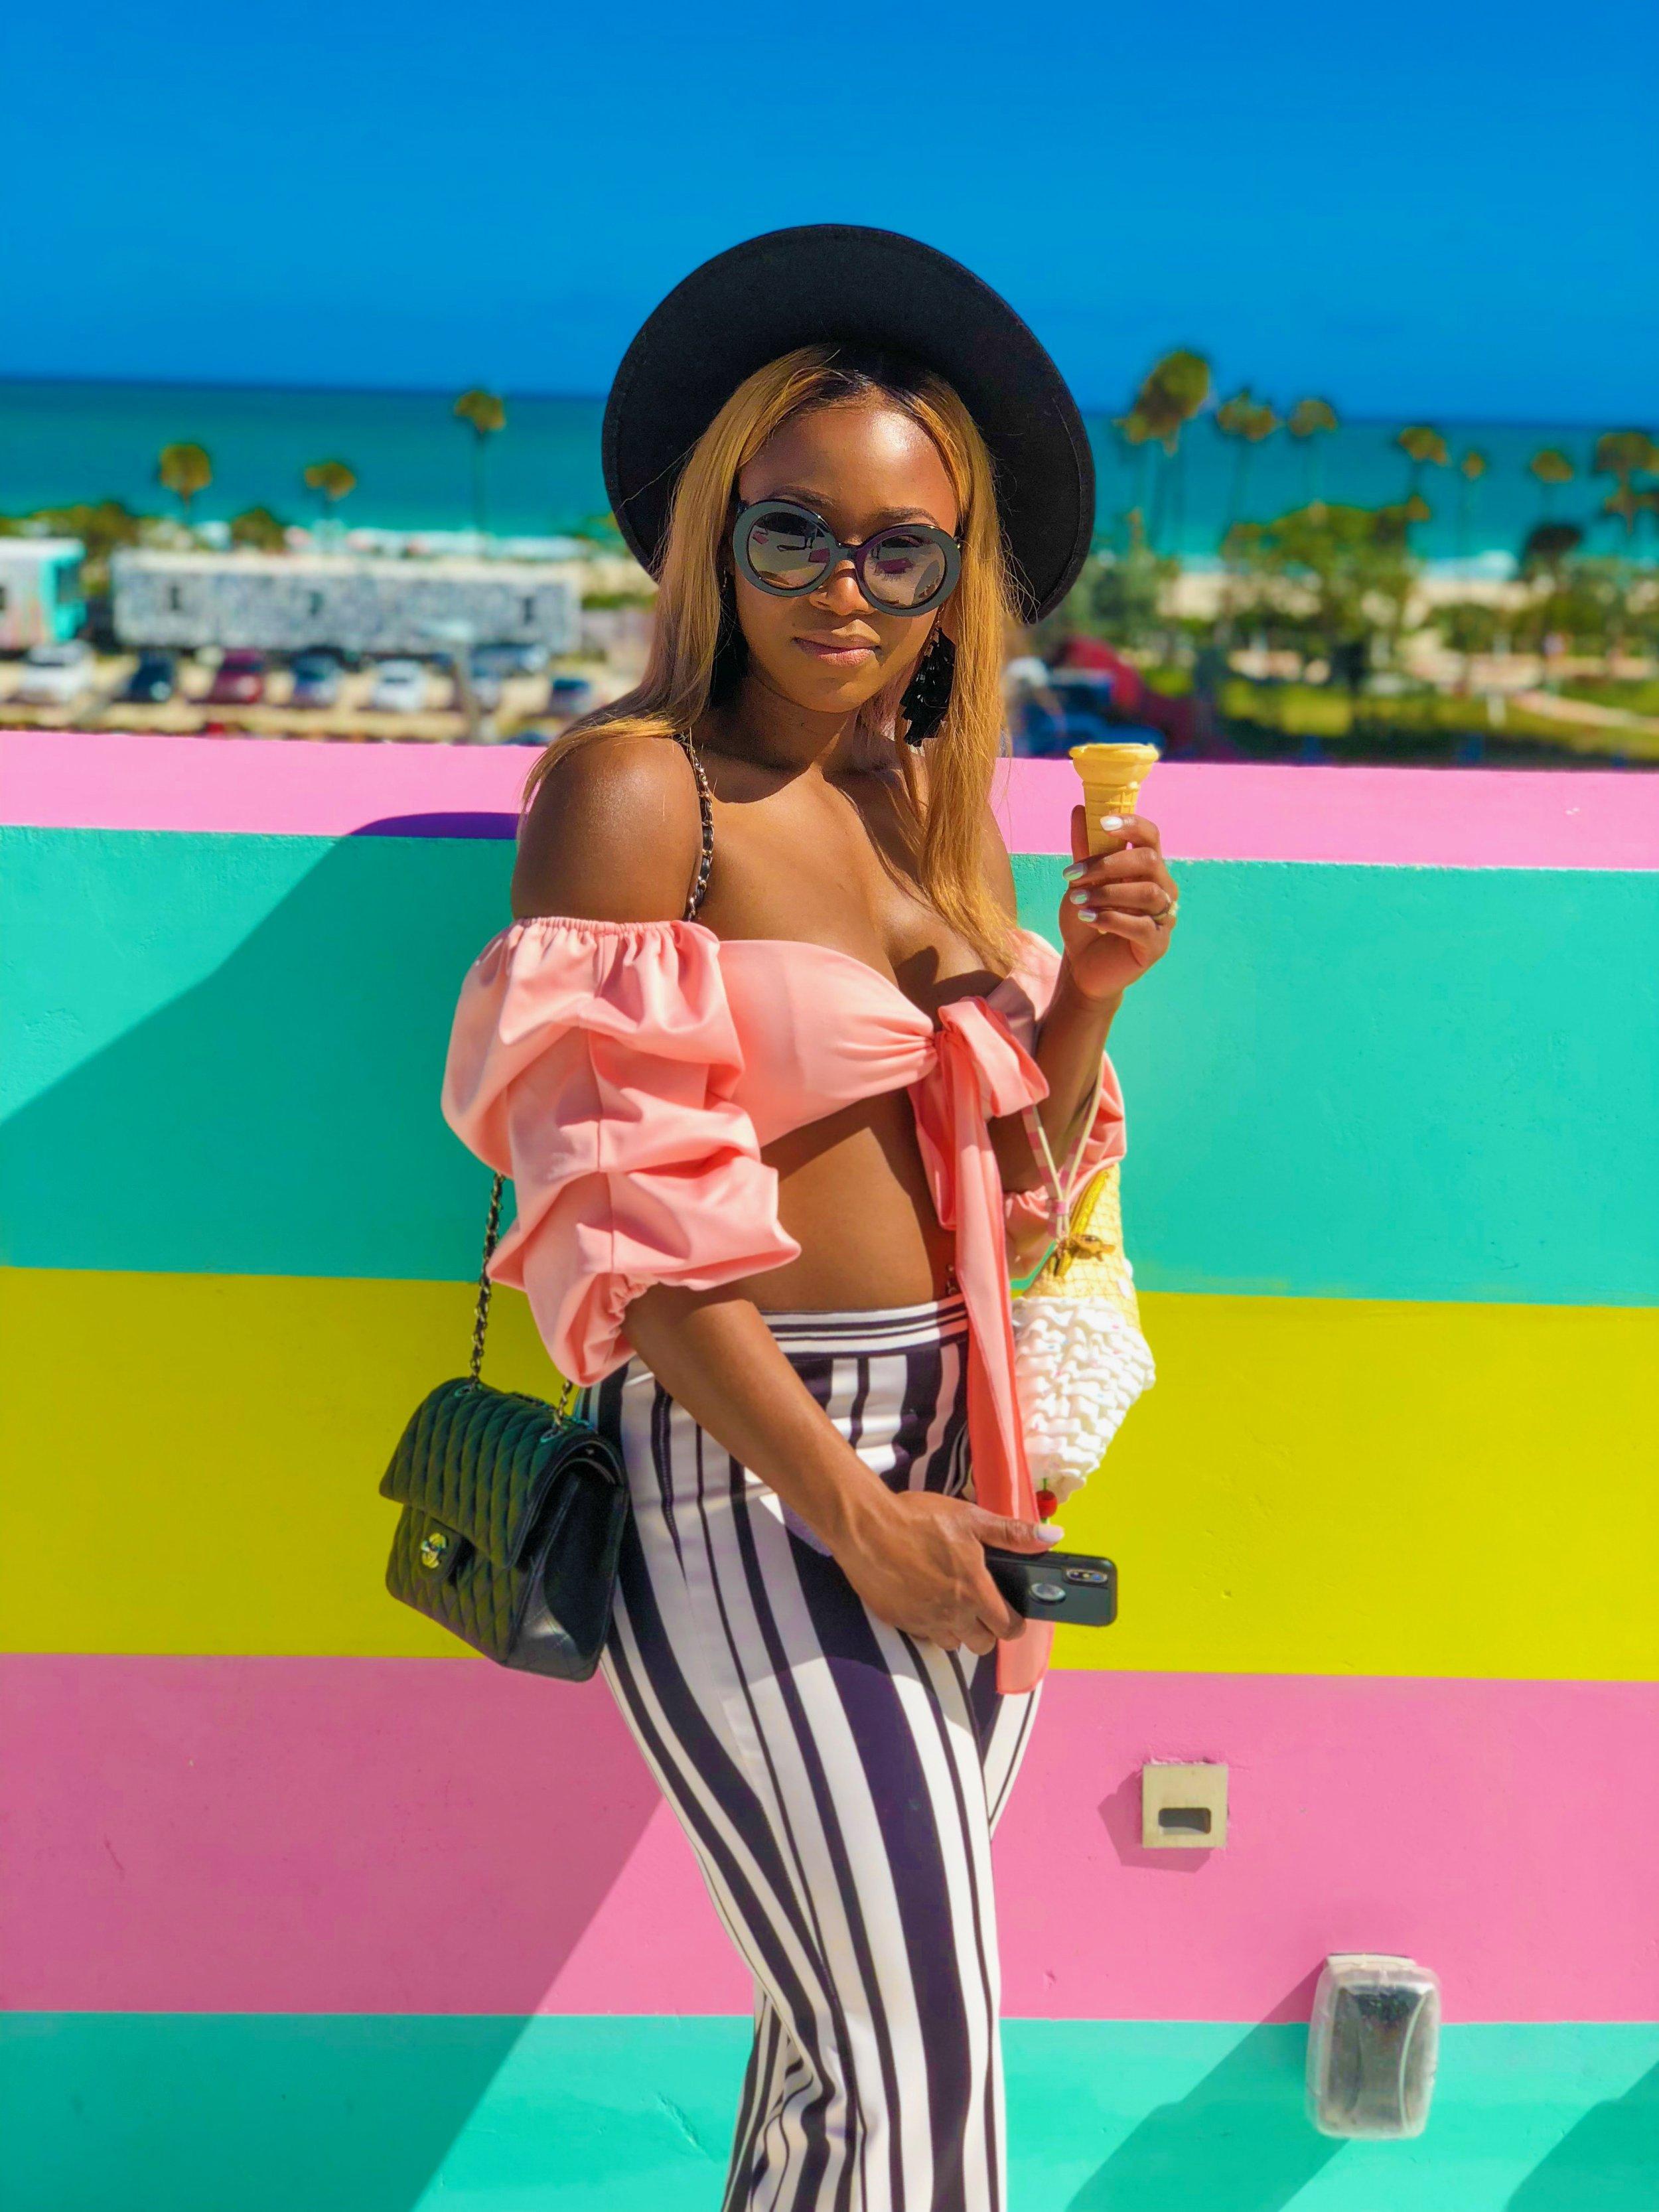 Location: The Museum of Ice Cream Miami  Top: Agaci  Pants: Top Shop  Hat: Boohoo  Sunglasses: Prada  Ice cream purse: Betsey Johnson  Handbag: Chanel